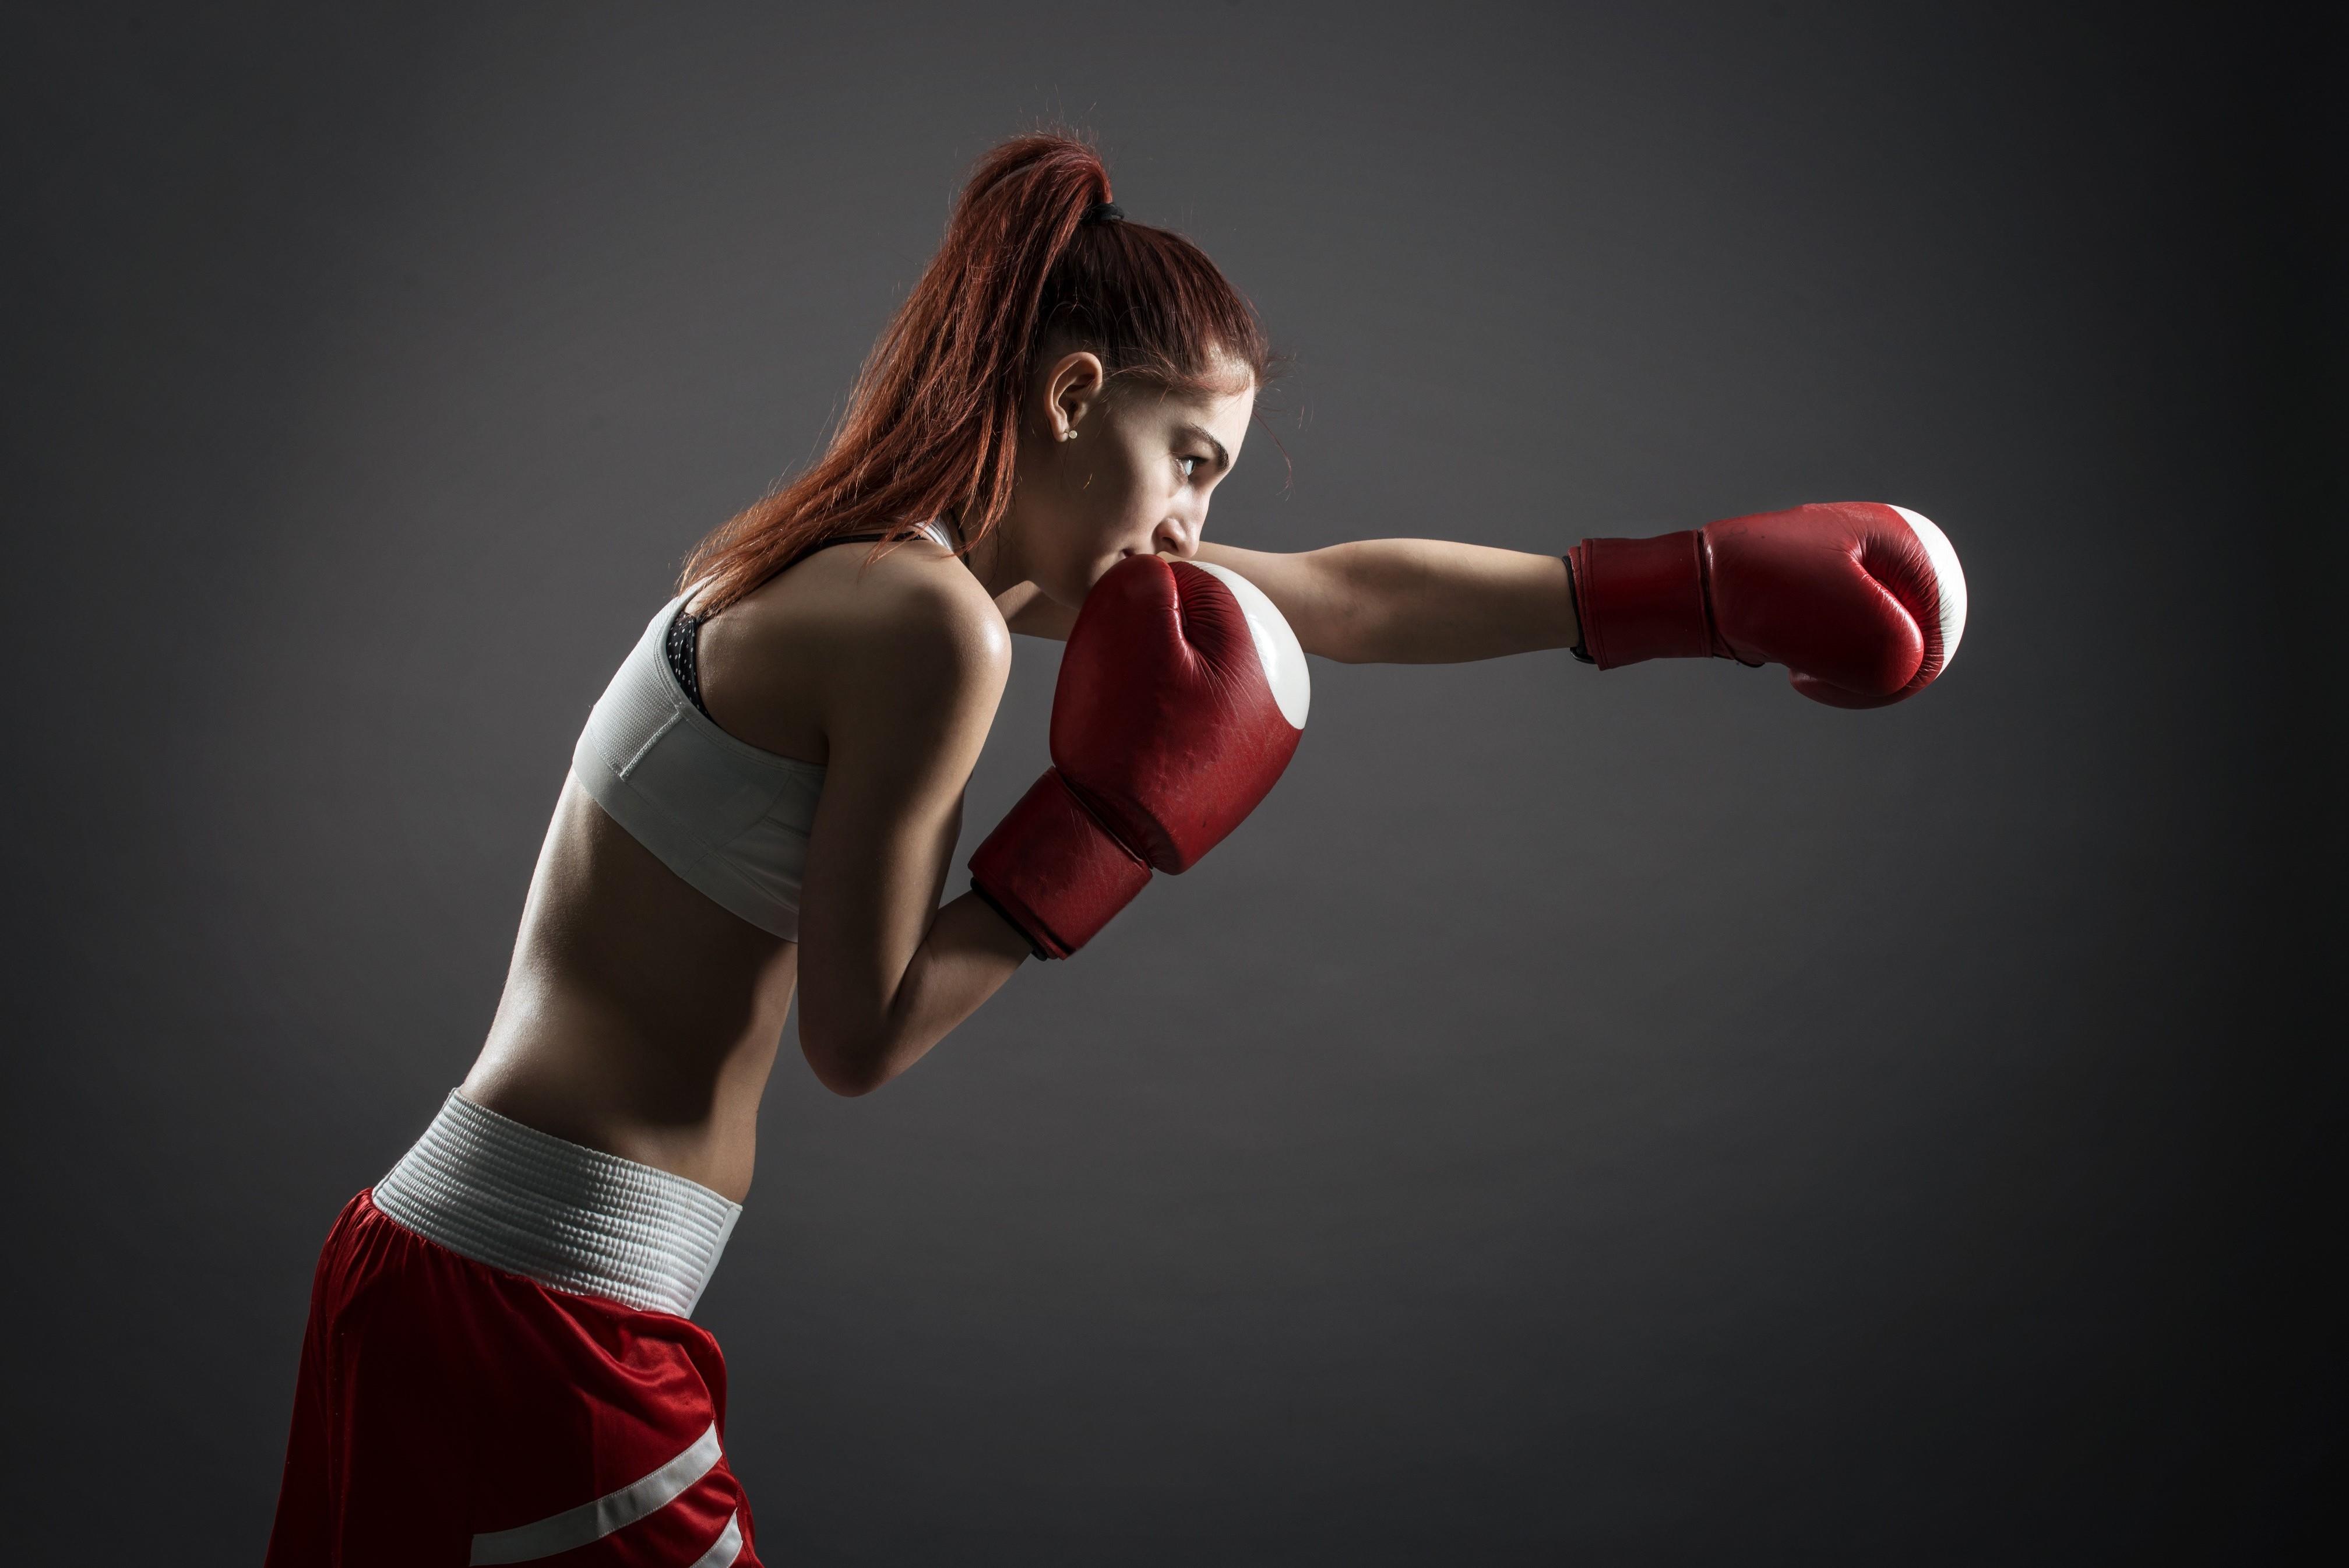 boxing female wallpaper 62529 4031x2691 px hdwallsourcecom